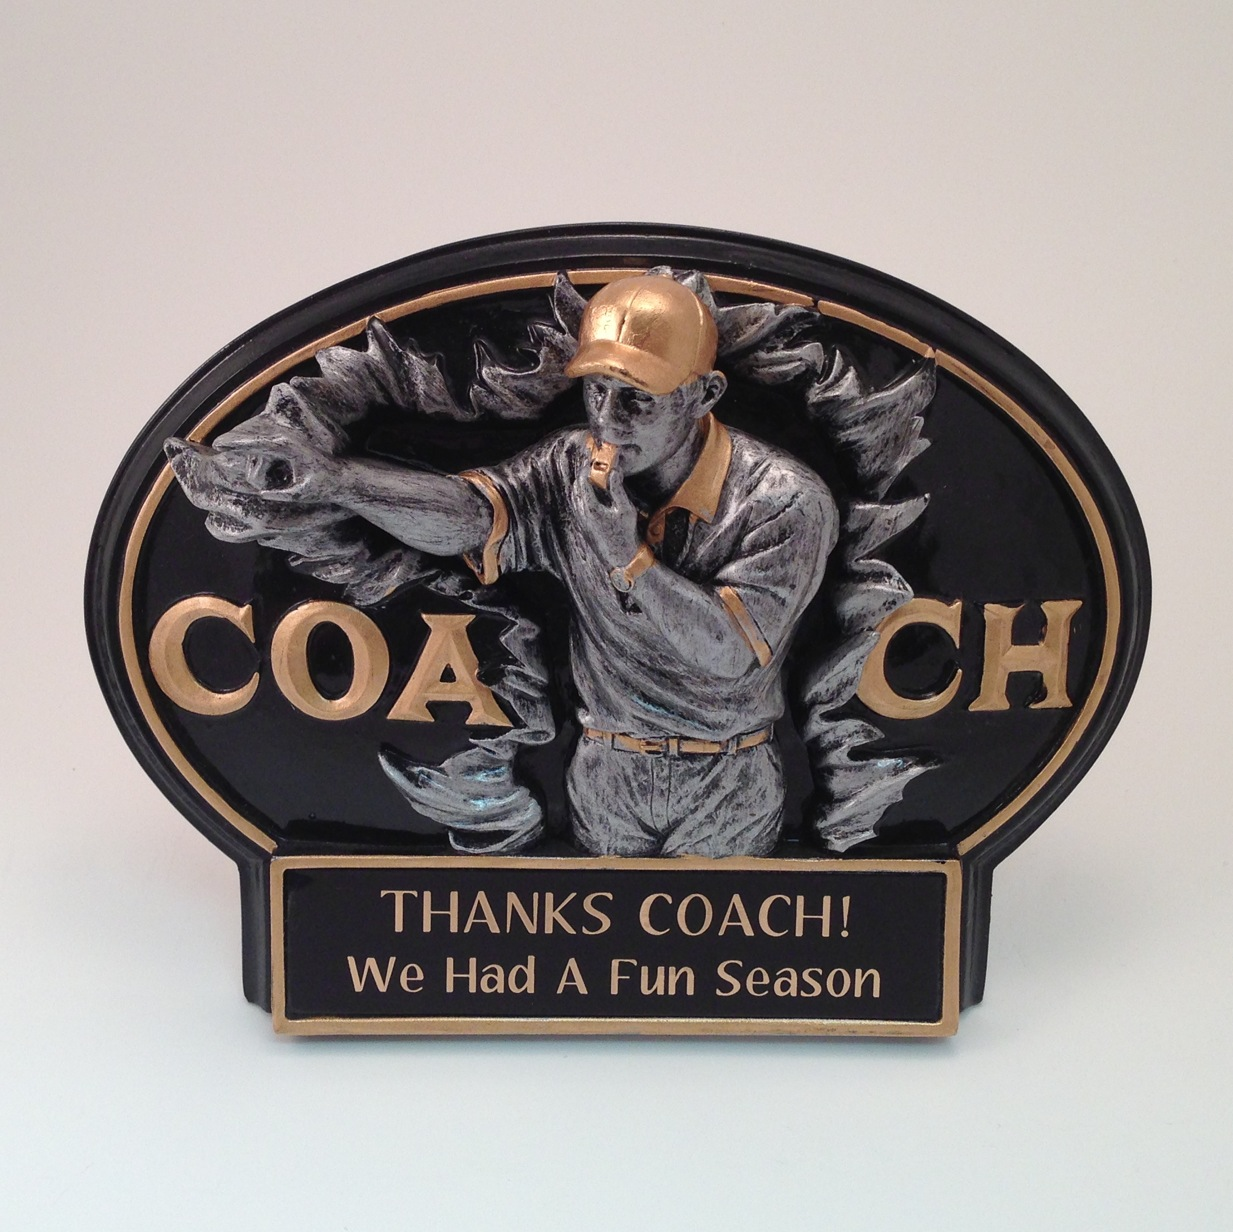 Coach Award -$18.75 each (Includes tax & engraving). [ITEM#:  14COACH ]